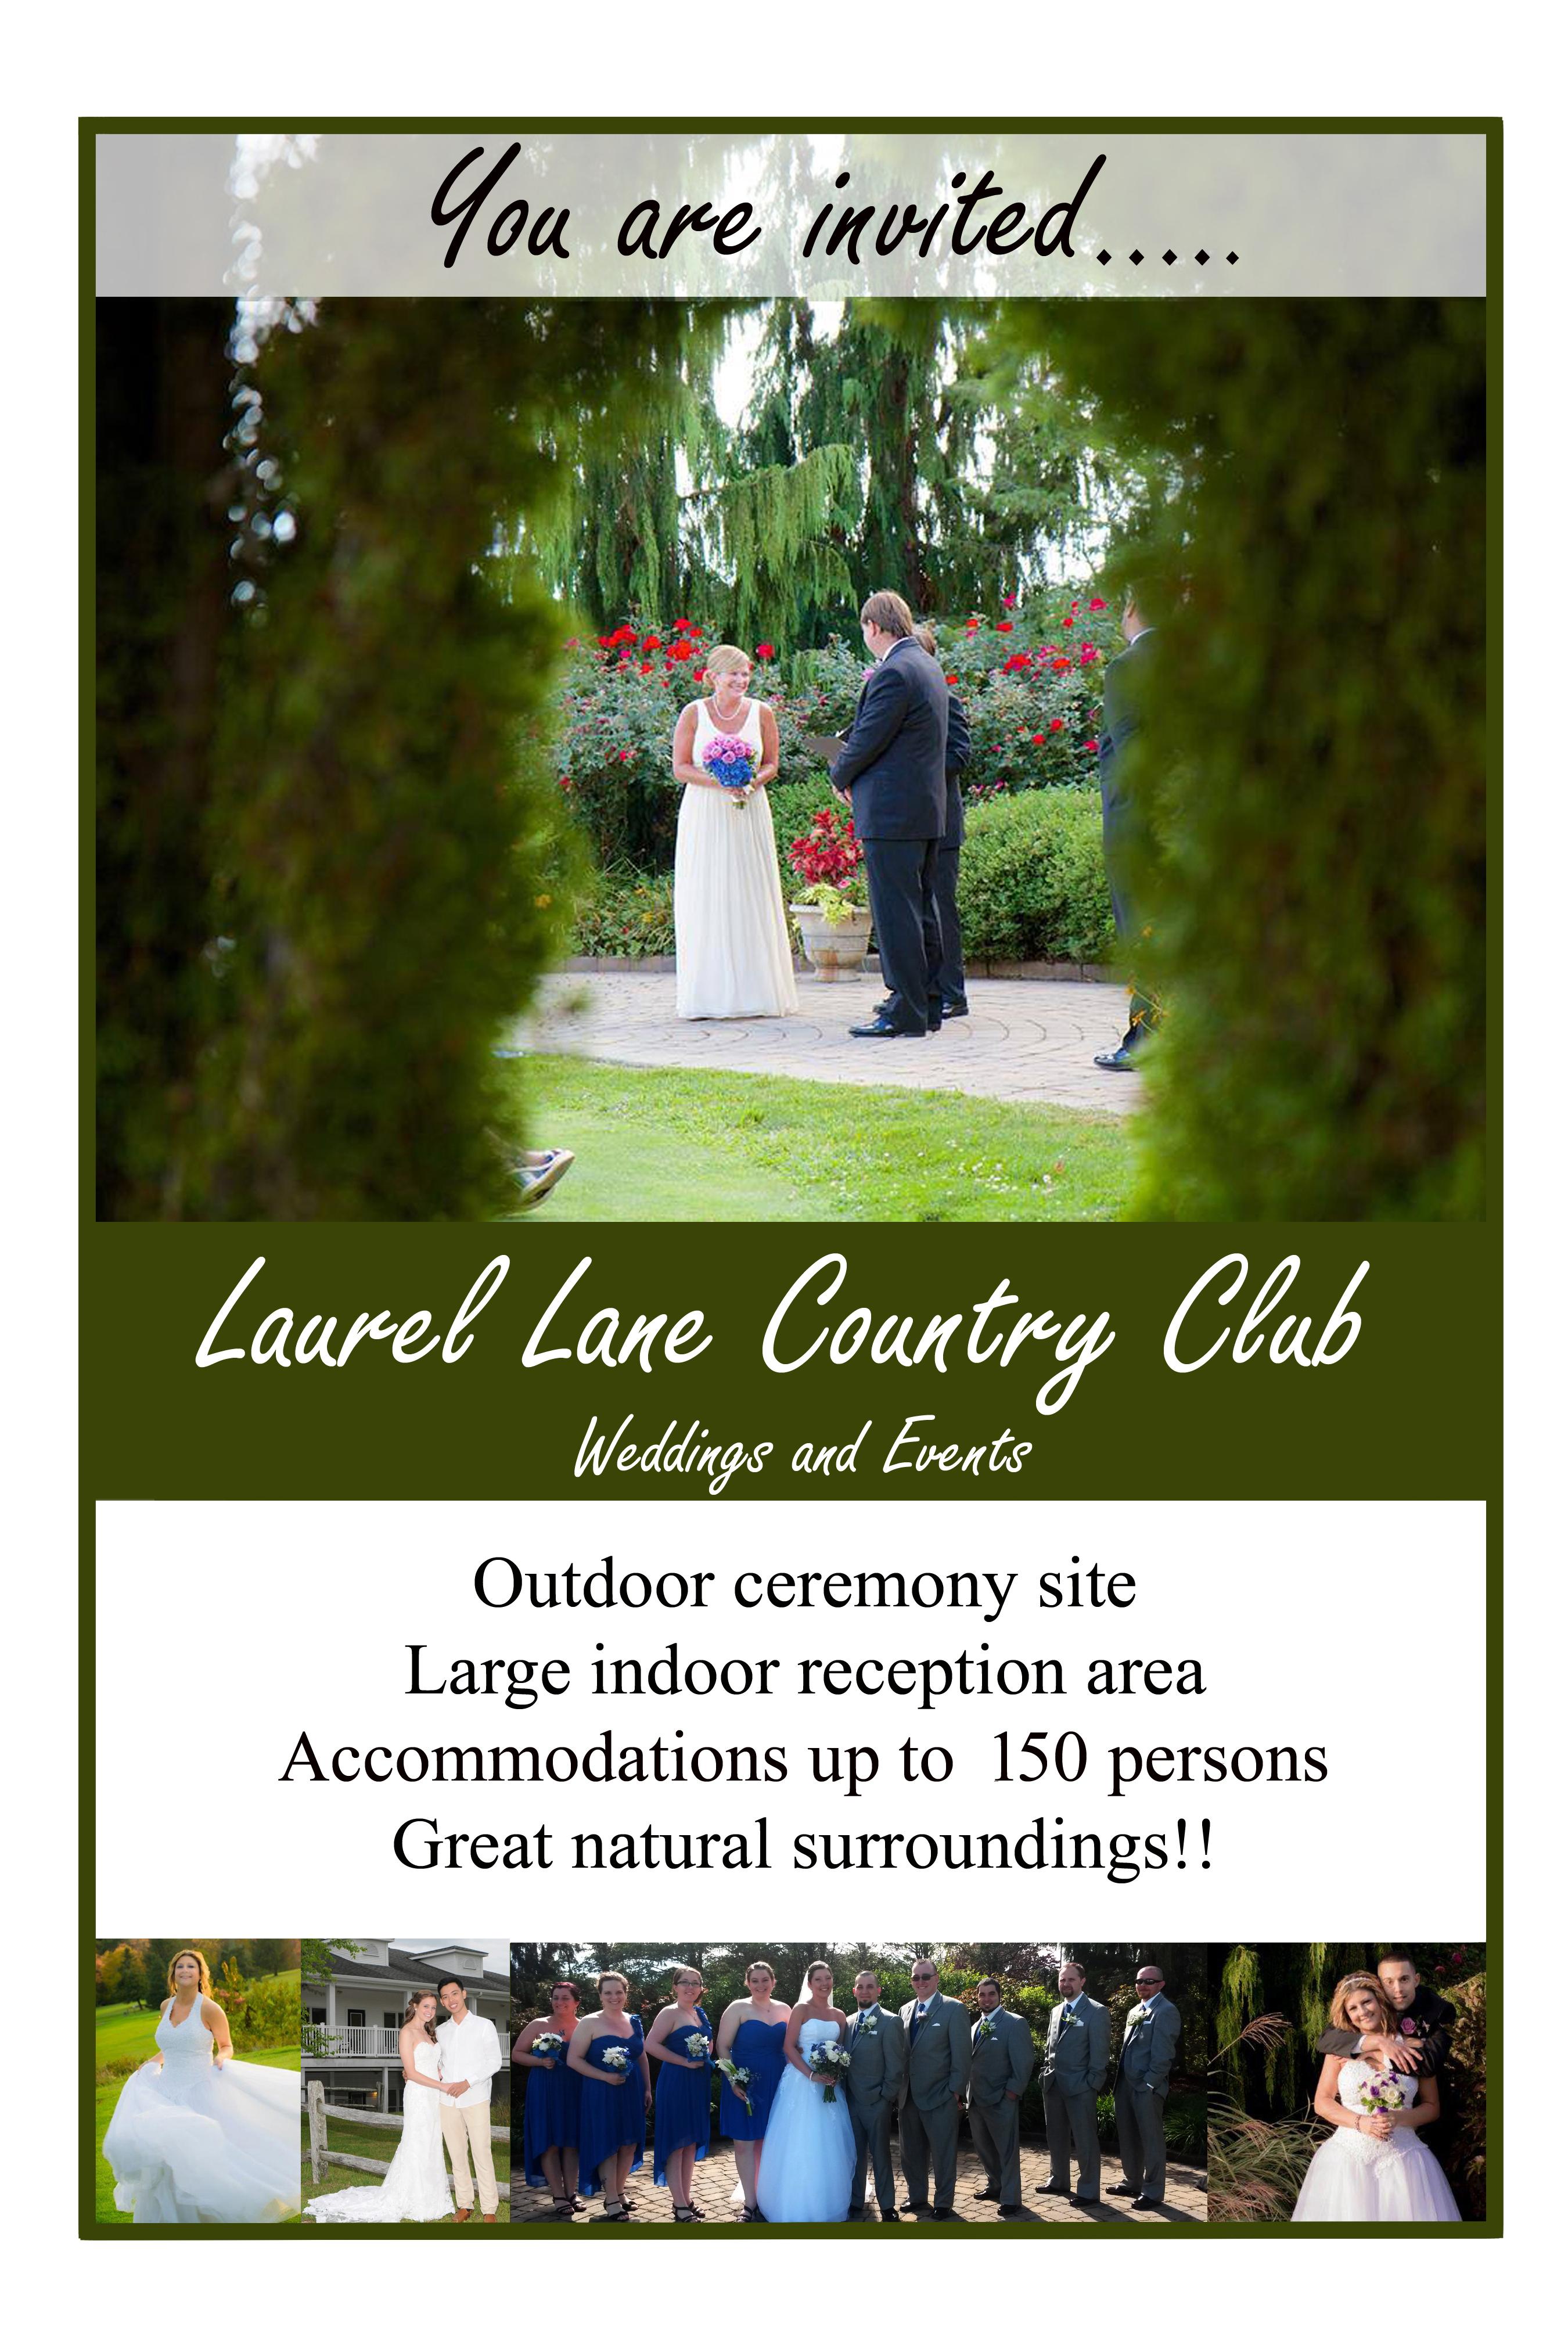 Laurel Lane Country Club image 35